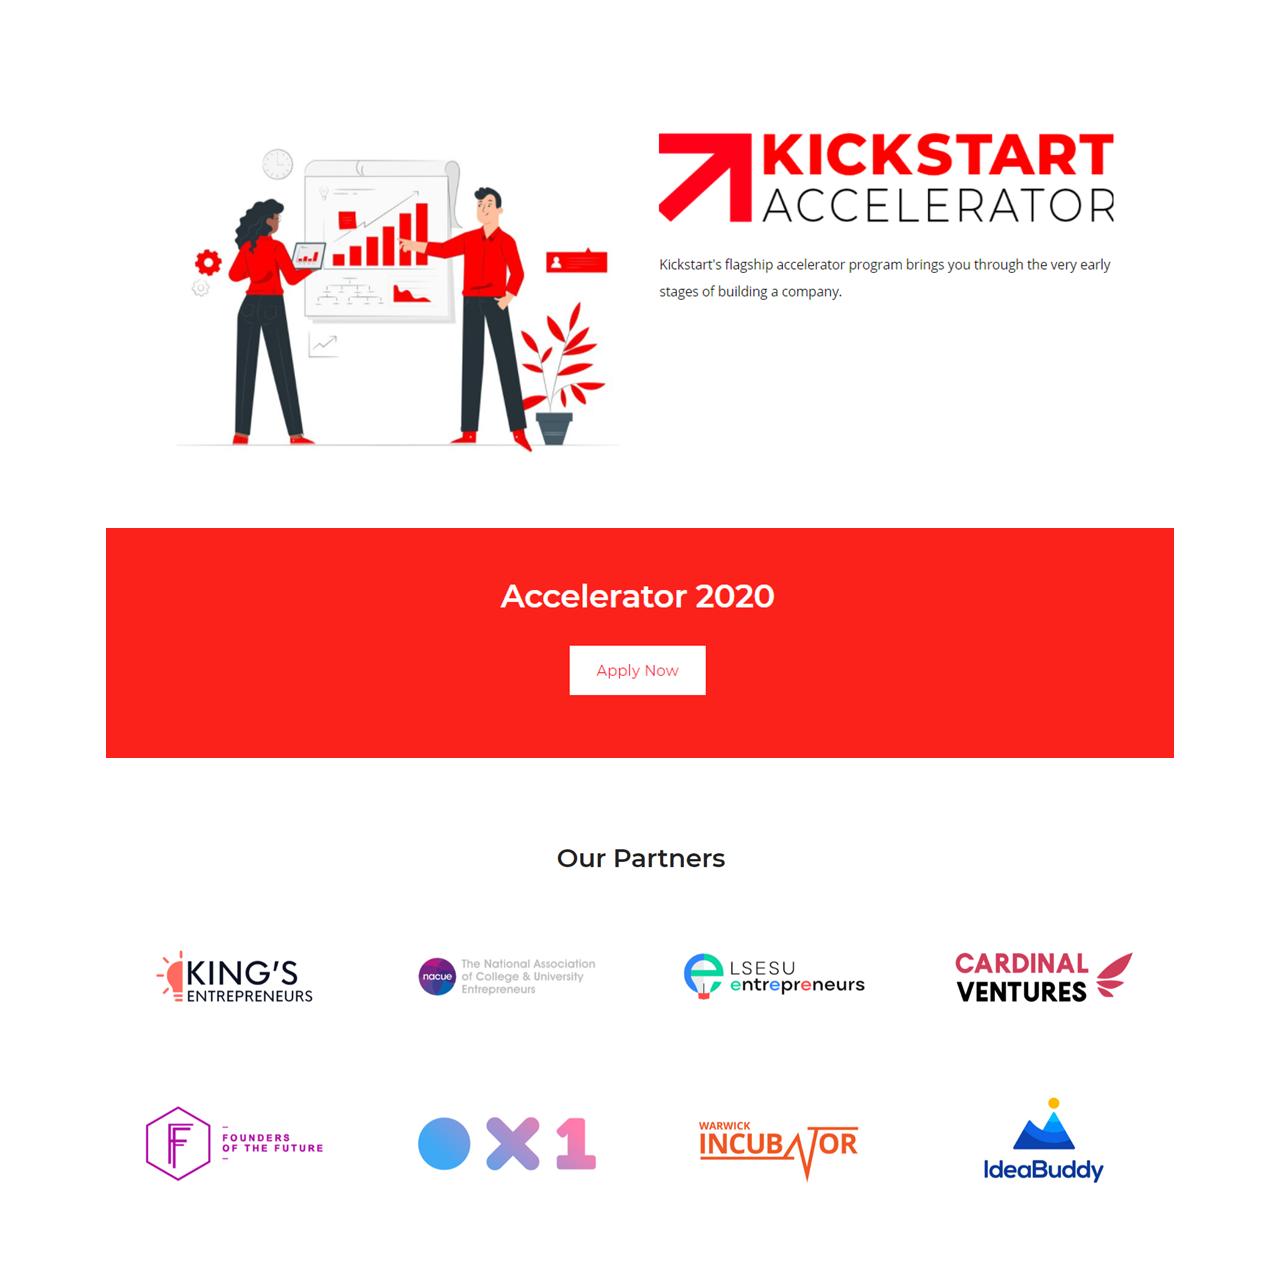 kickstart global ideabuddy partnership